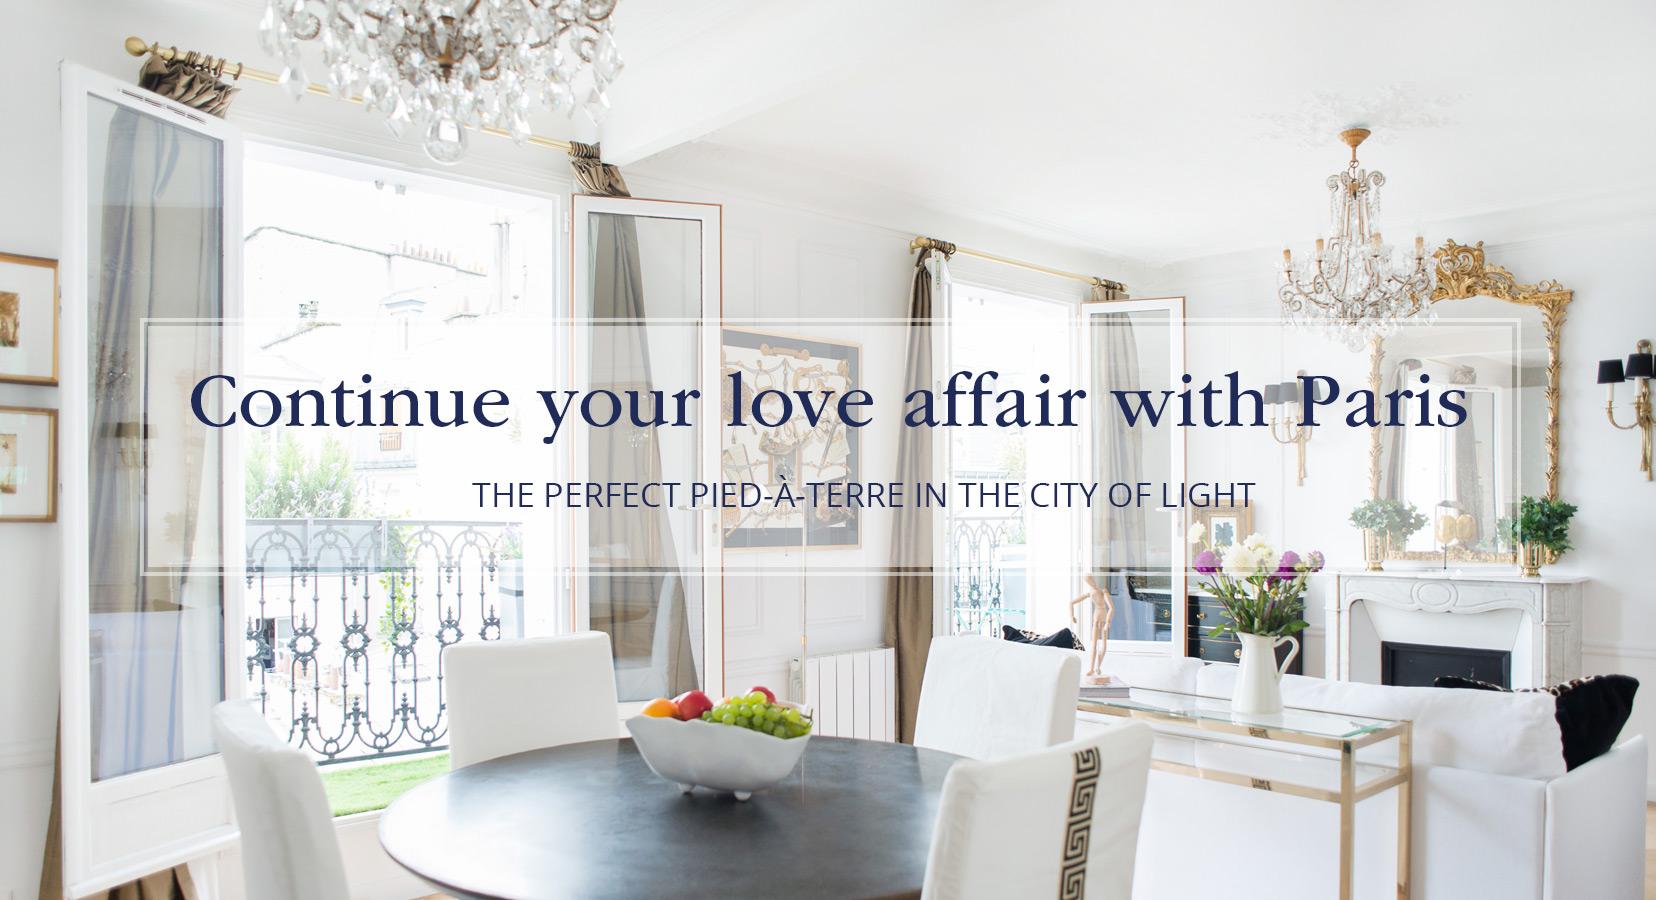 Continue your love affair with Paris